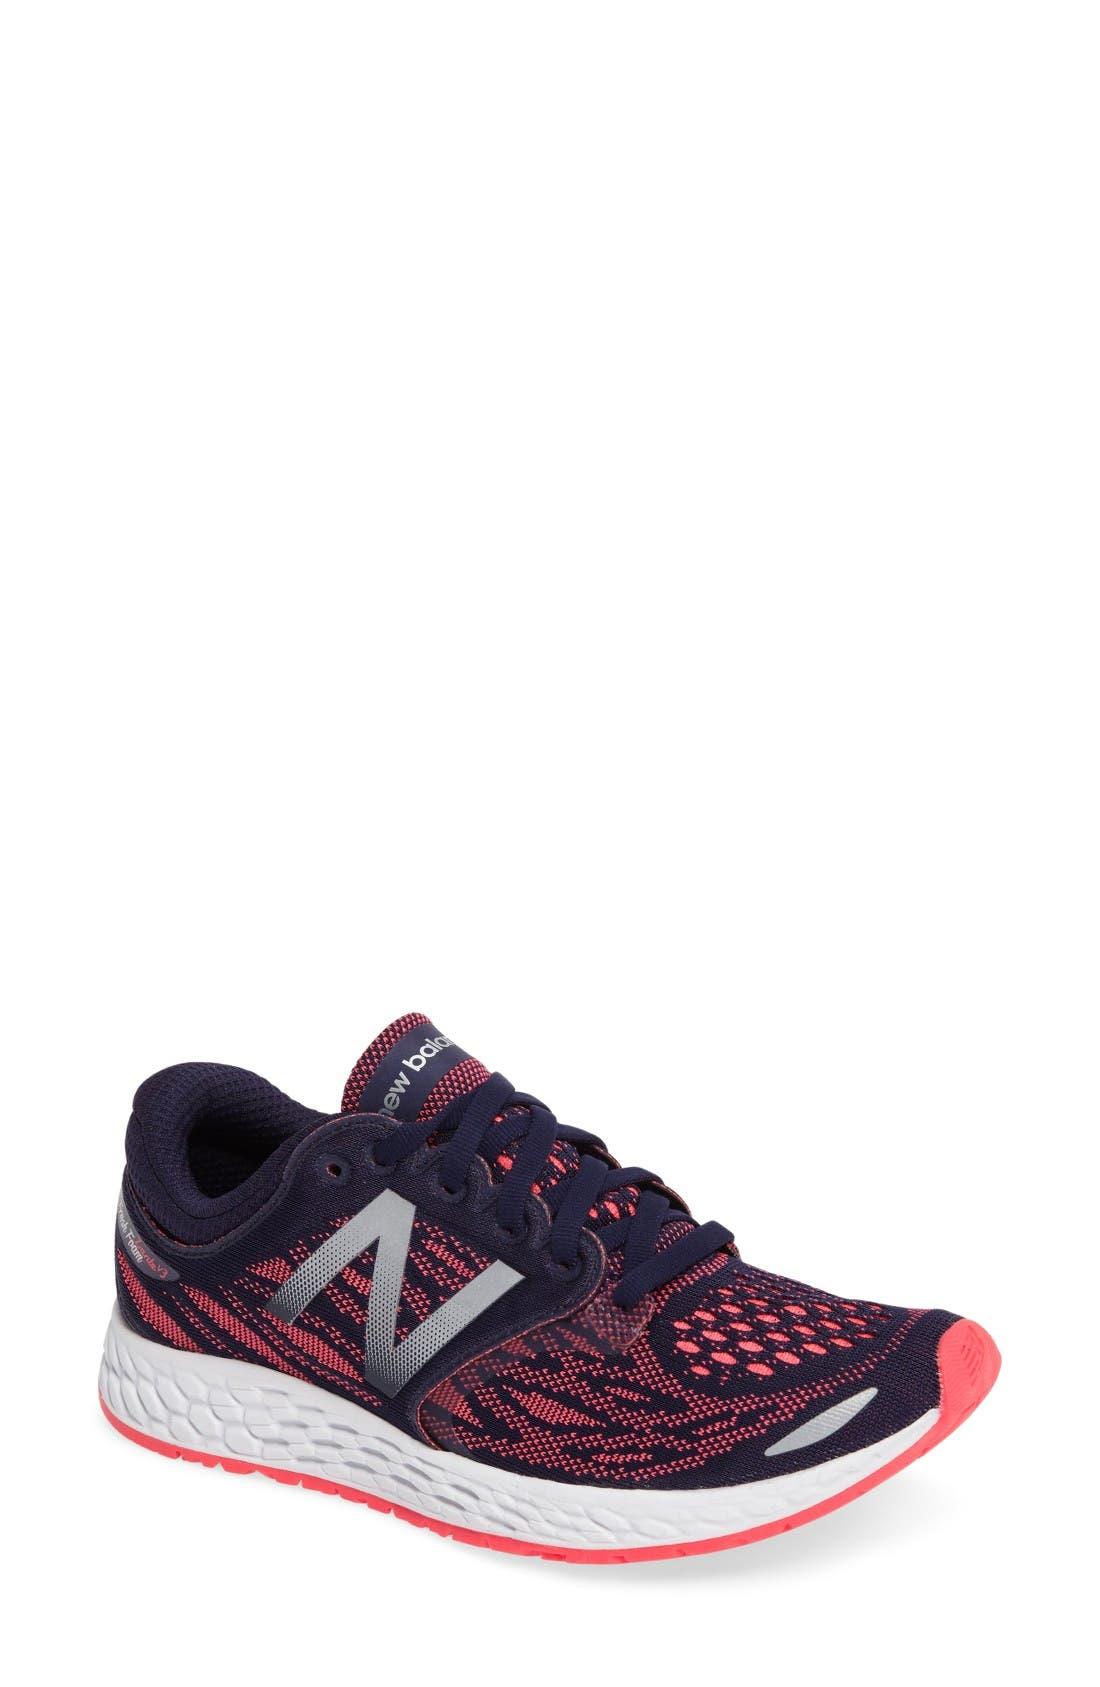 Main Image - New Balance Zante V3 Running Shoe (Women)